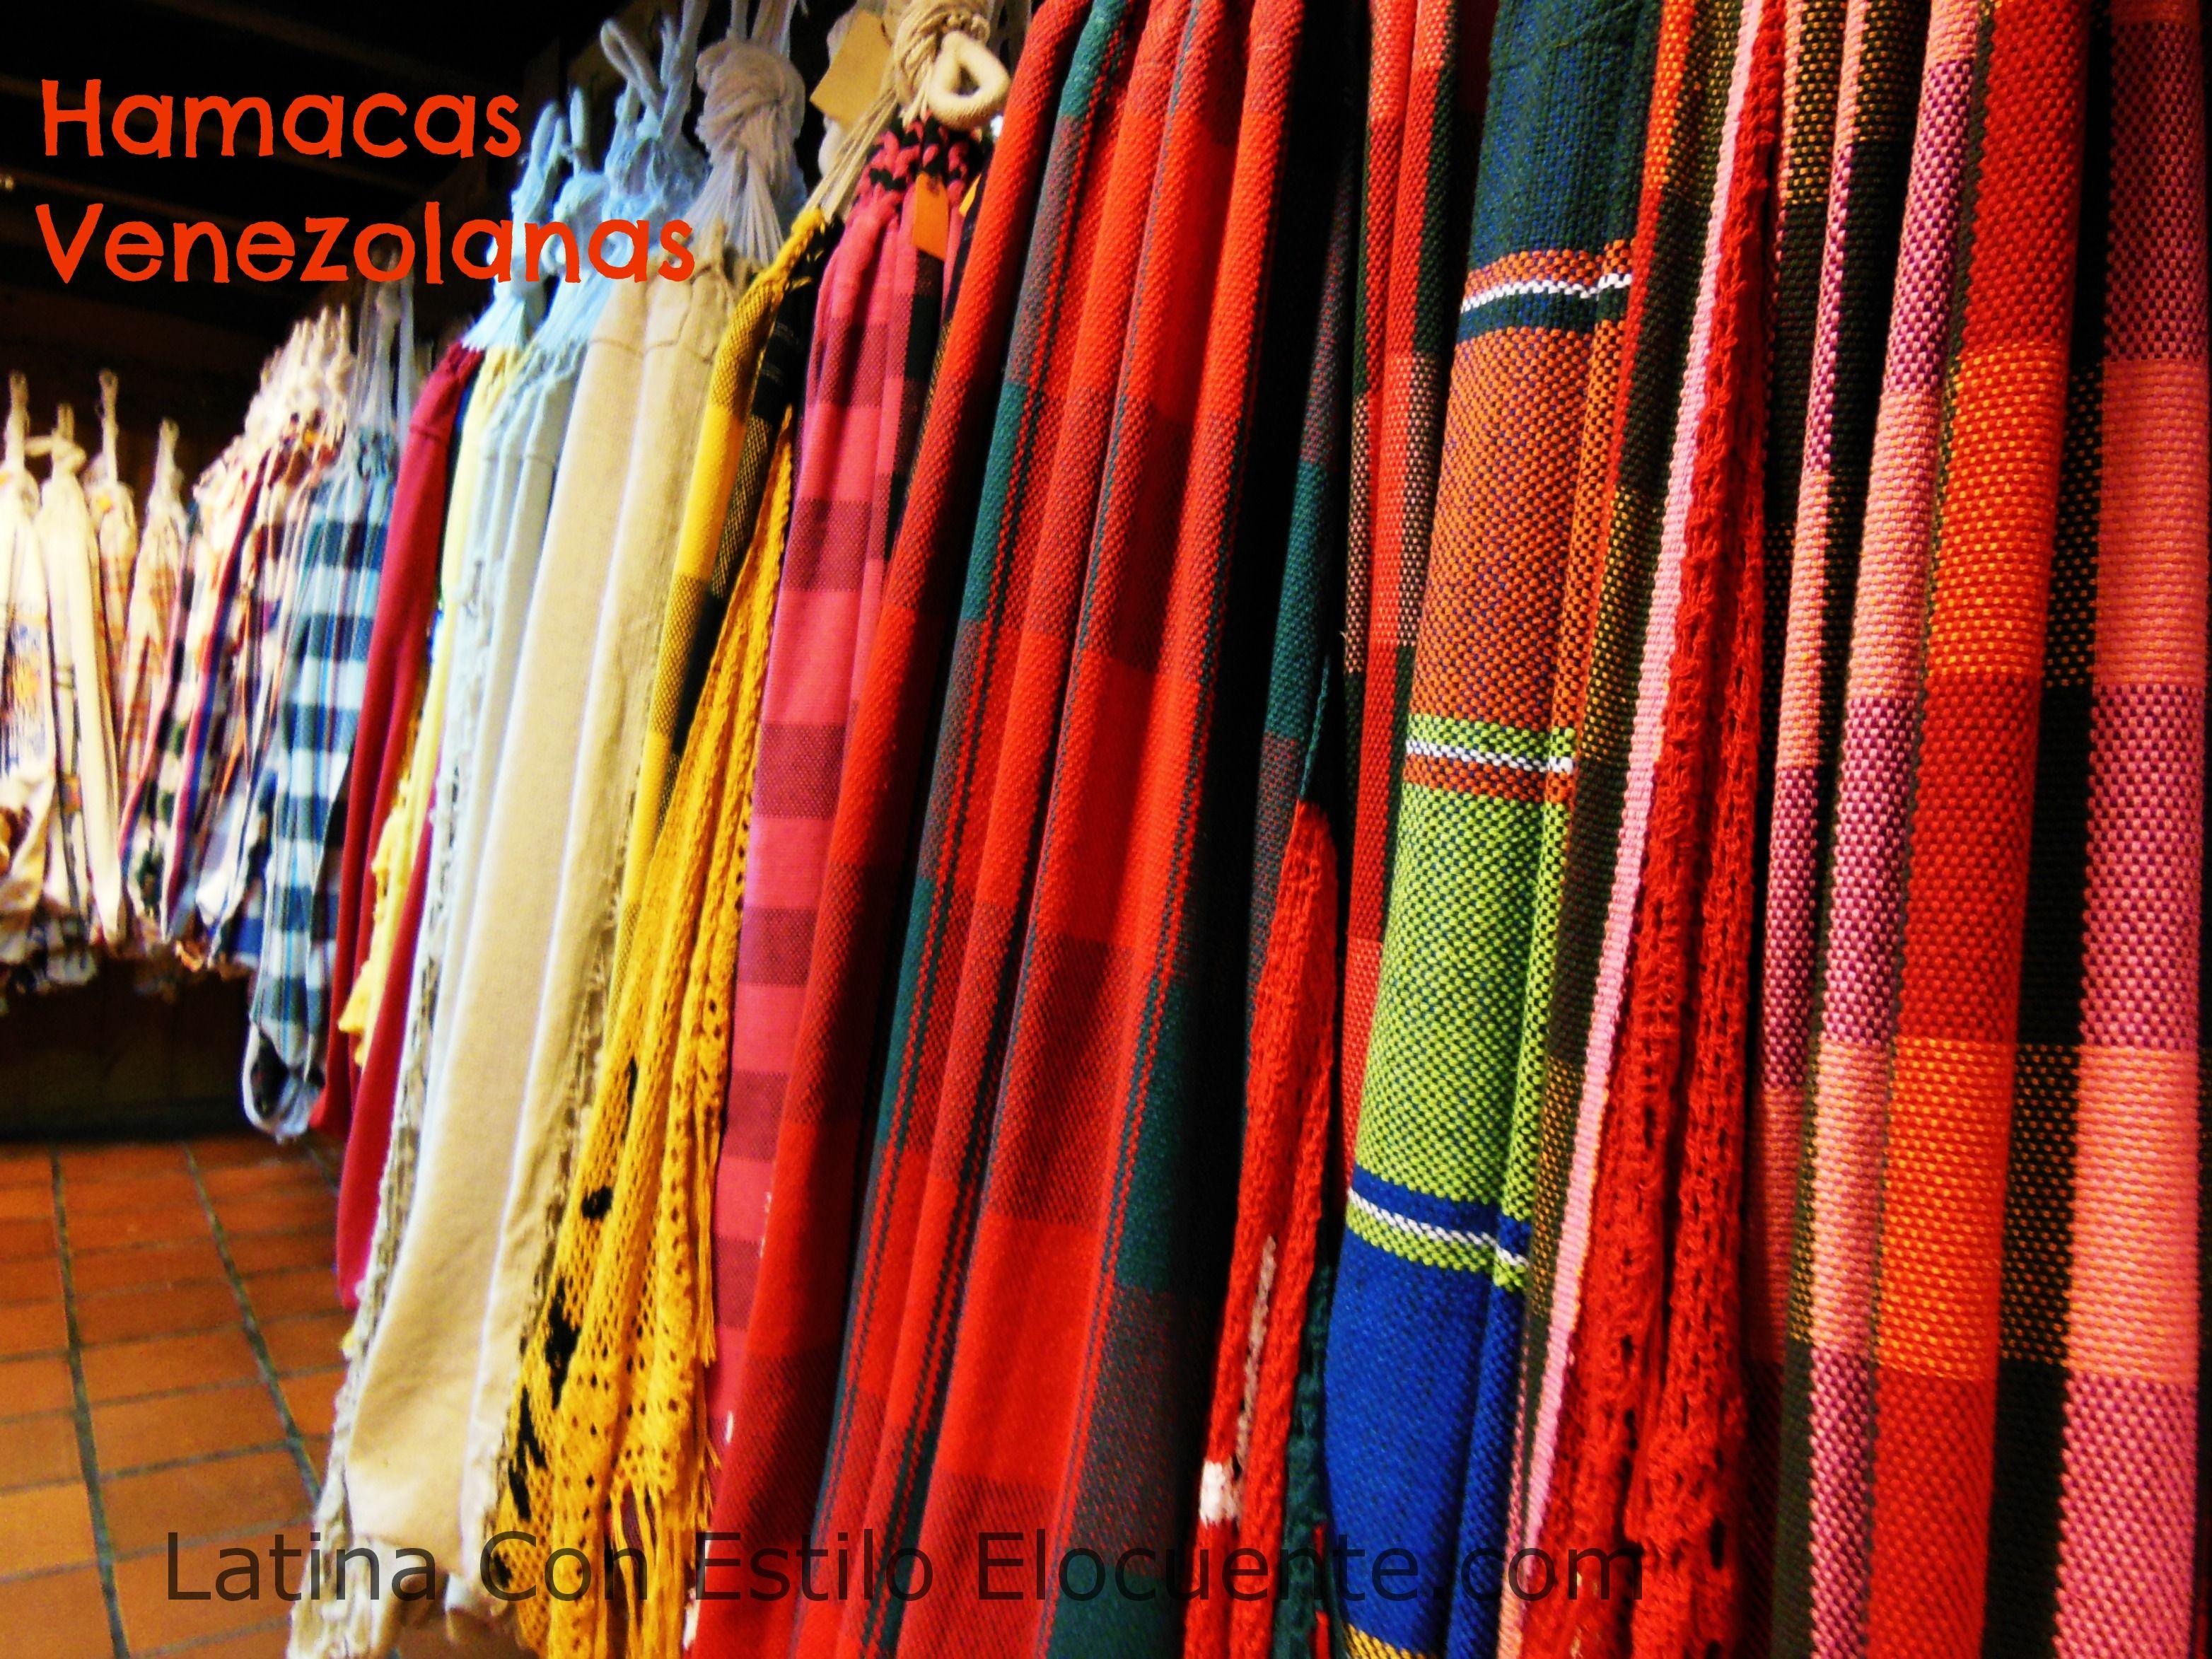 Reto Escapada cultural al Hatillo centro de artesanias Venezolanas. #thaliaenvivo #hbolatino #nicheparent